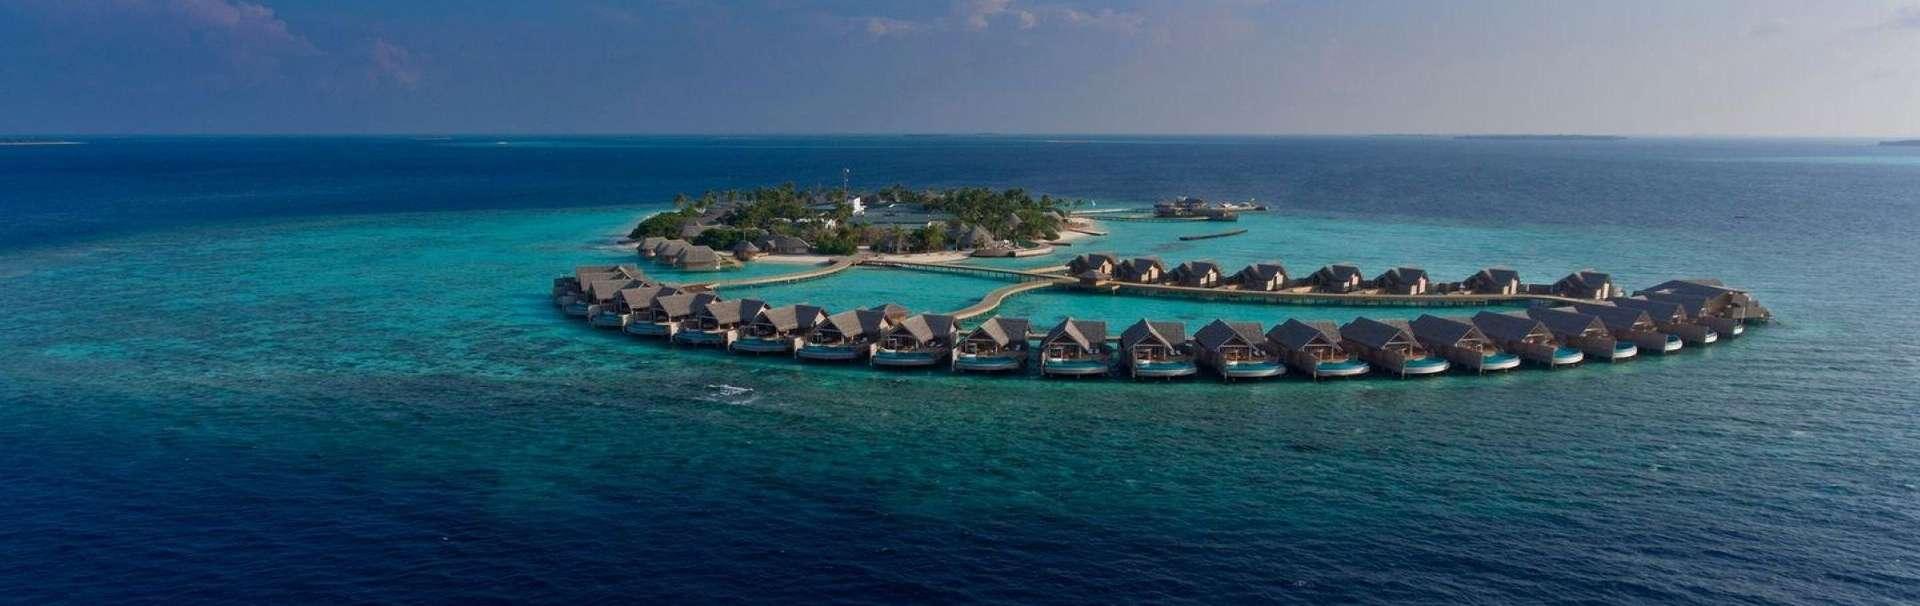 Milaidhoo Island Maldives - FAQS